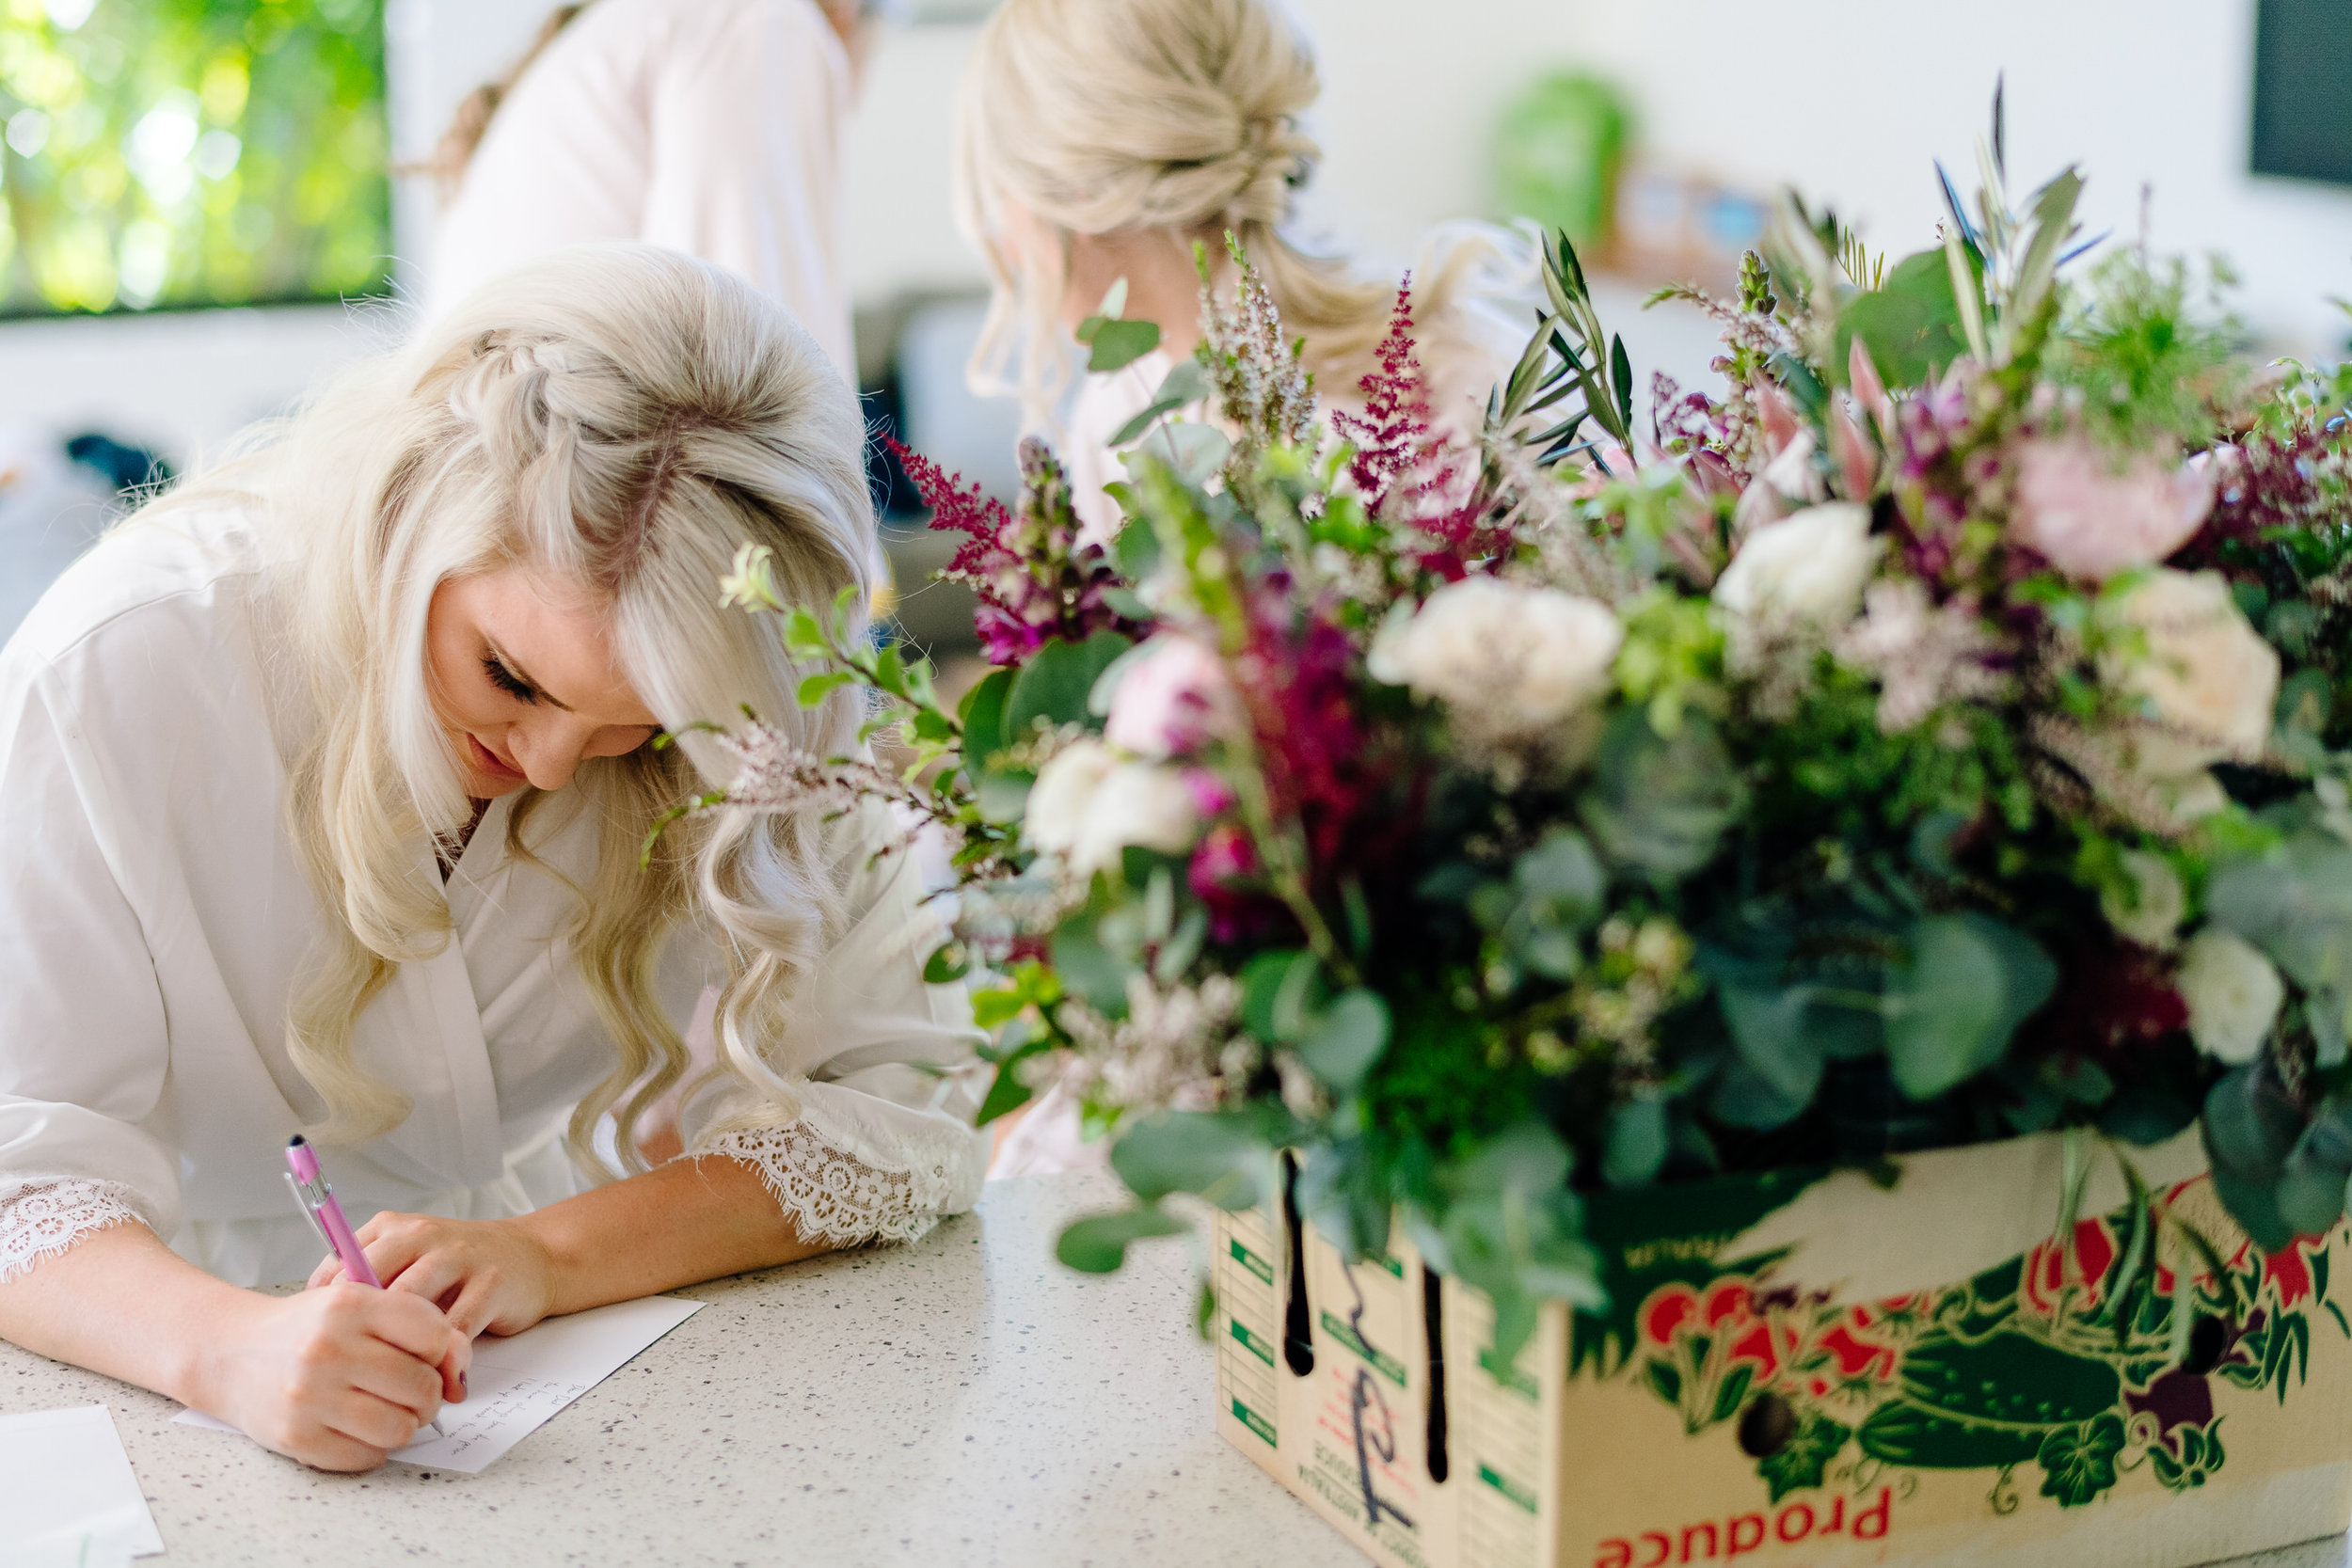 Justin_And_Jim_Photography_Byron_Bay_Wedding012.JPG